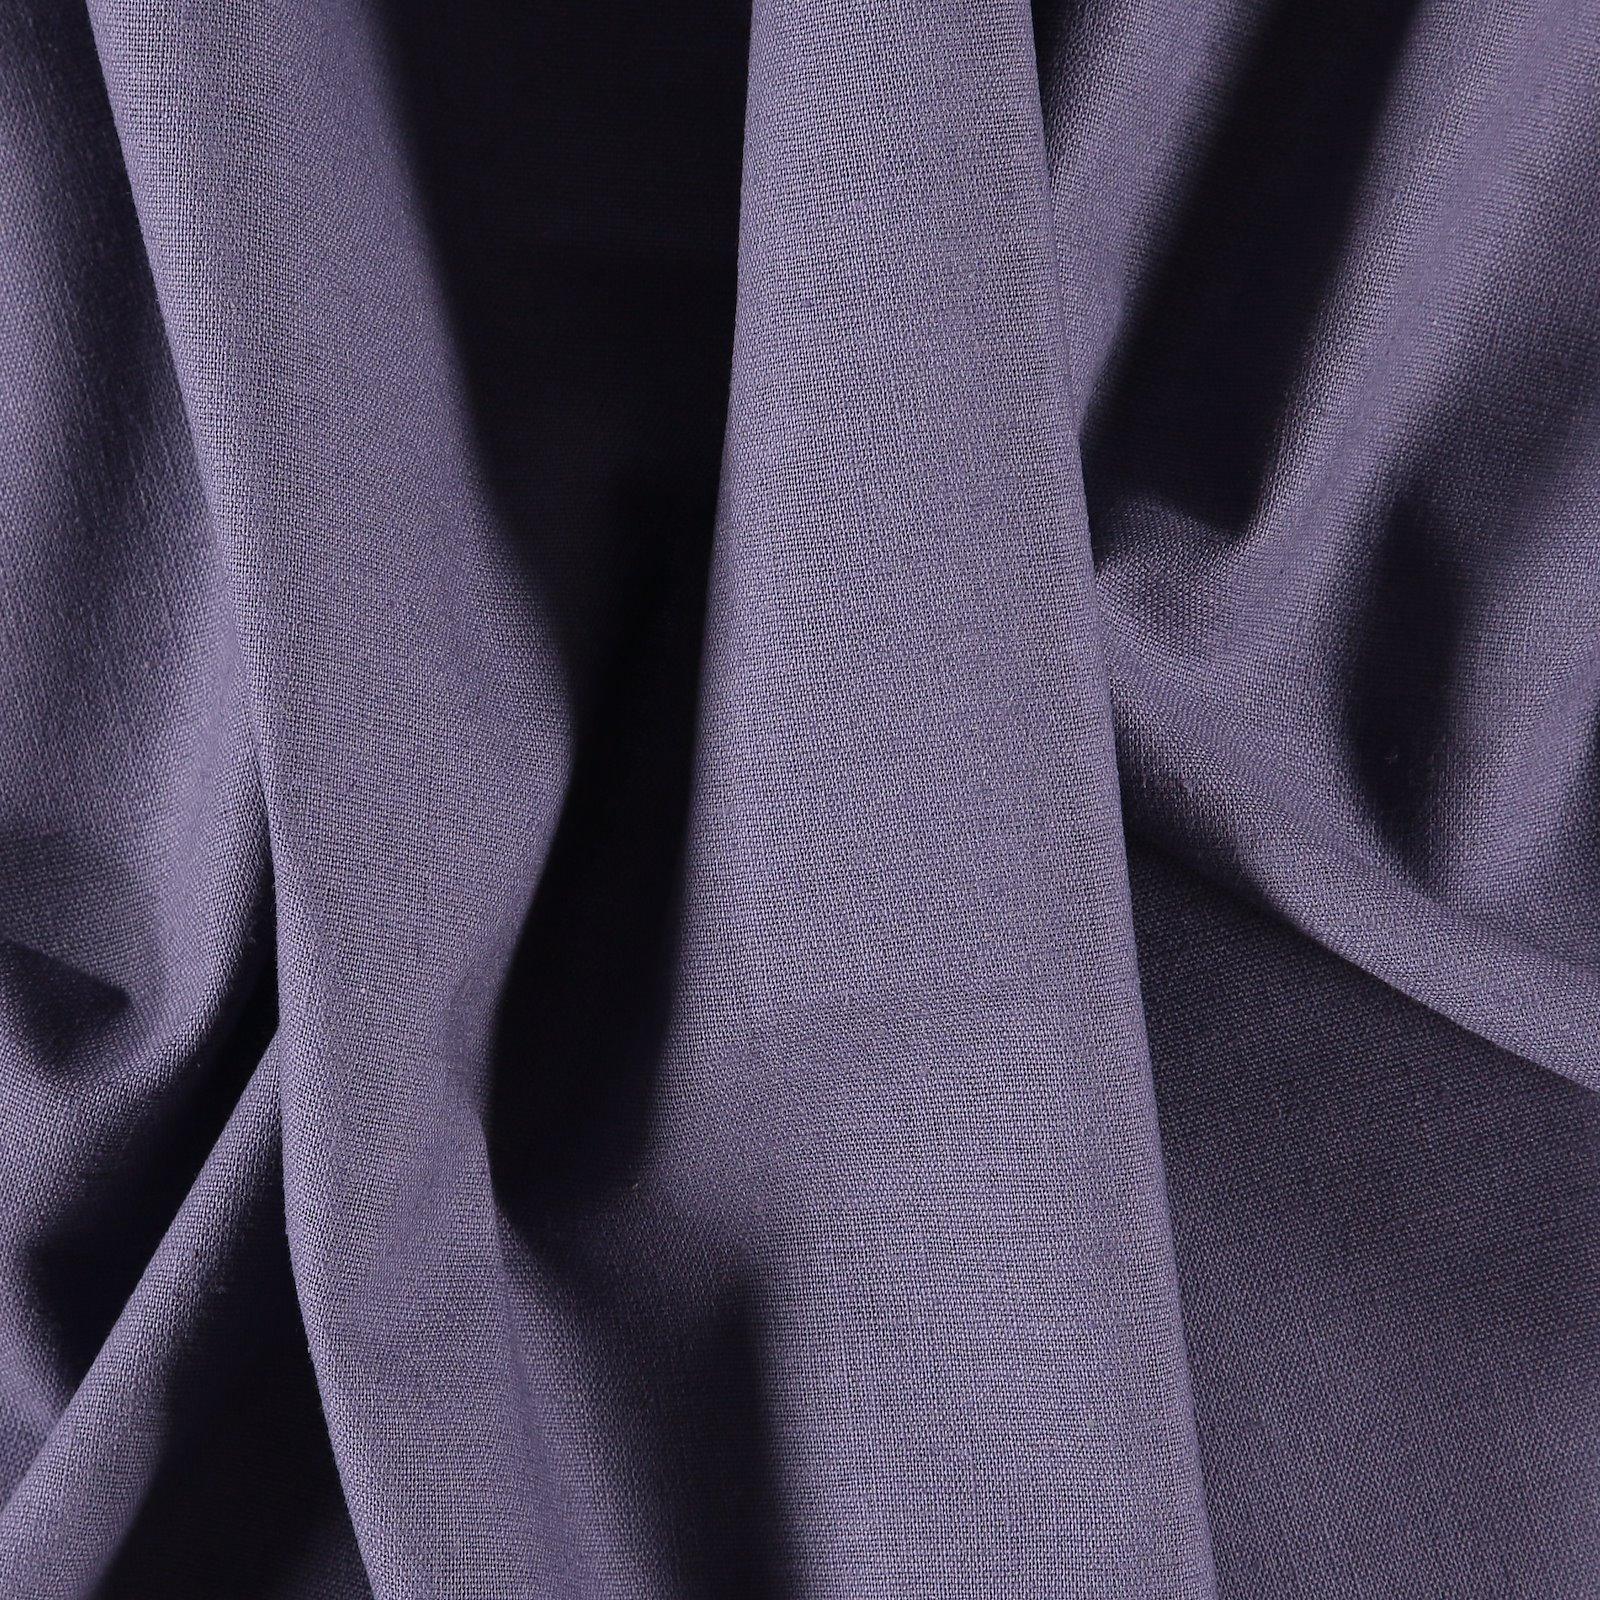 Linen/cotton dark dusty purple 410138_pack